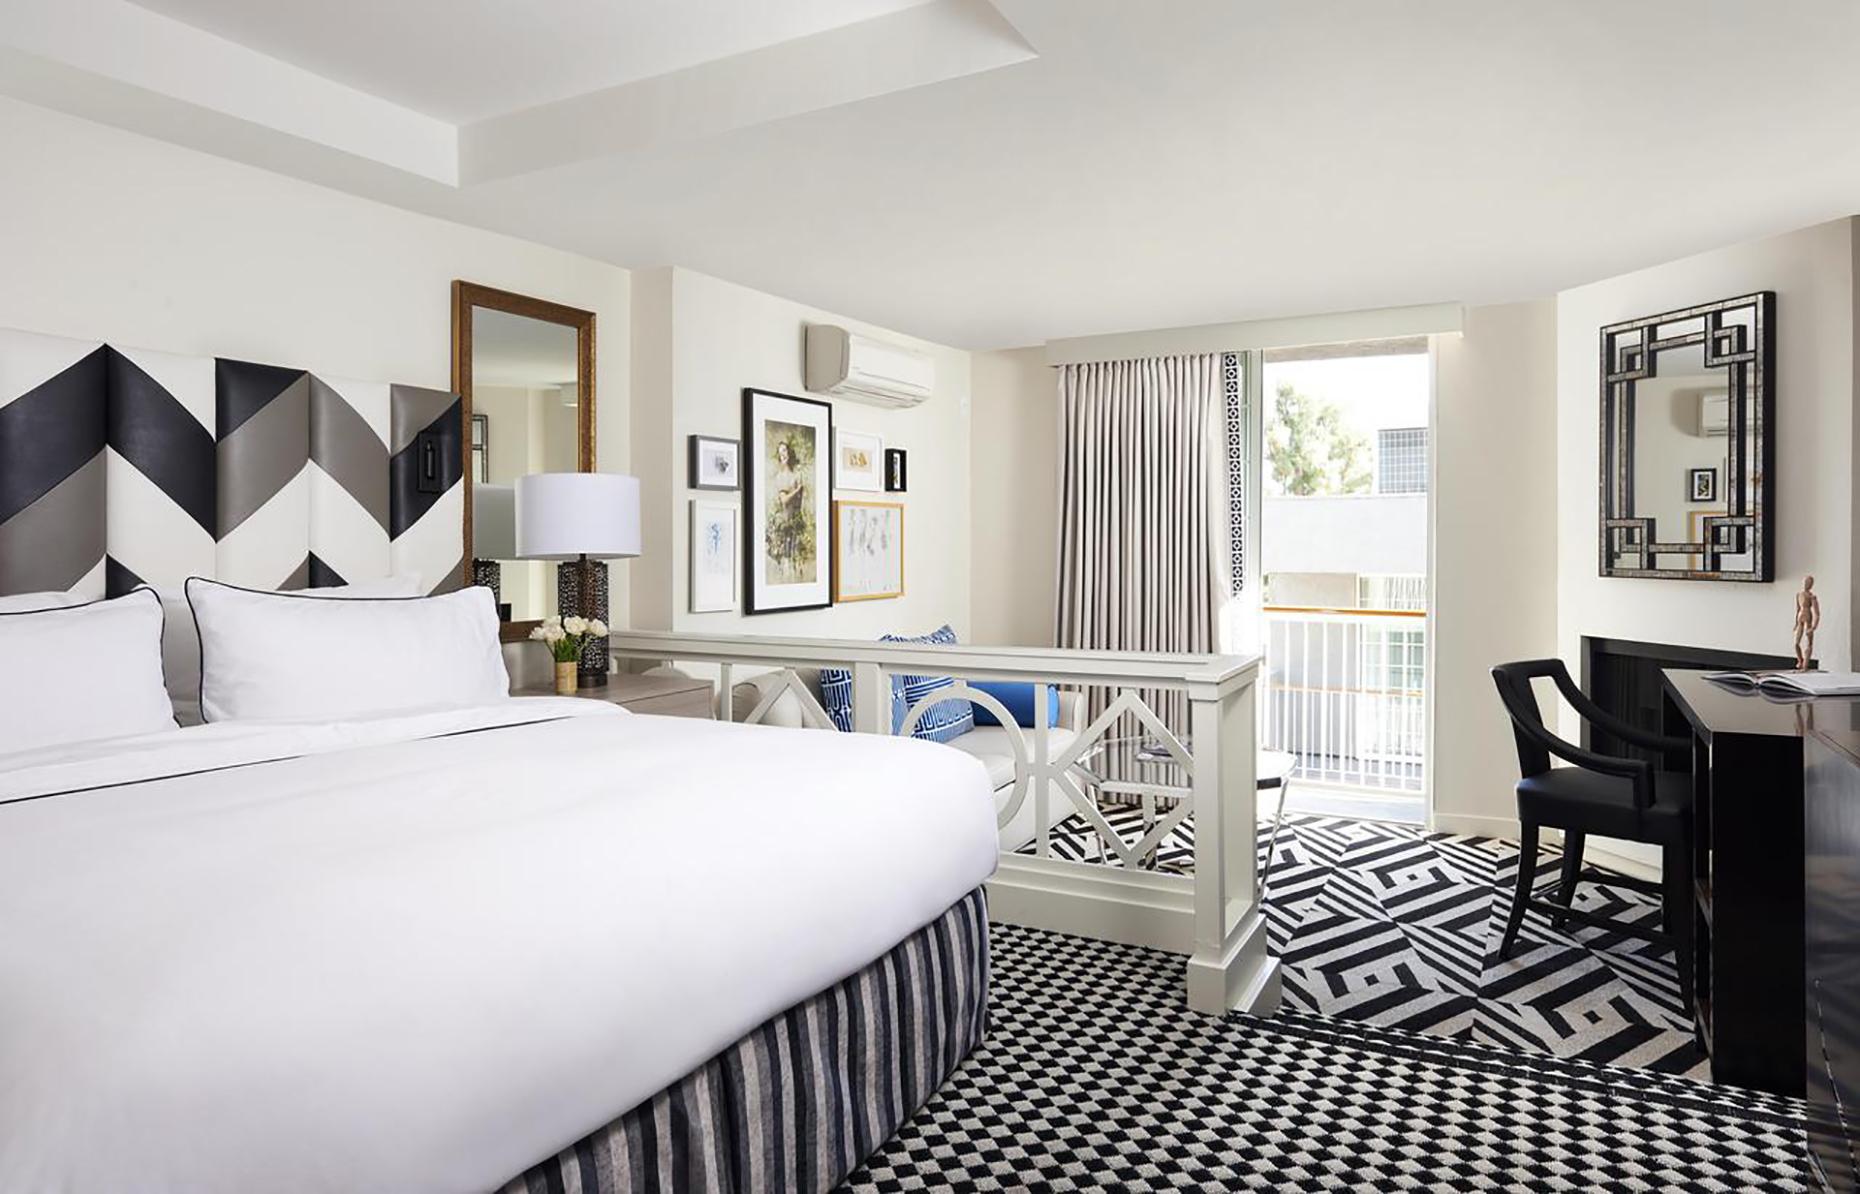 Chamberlain hotel West Hollywood